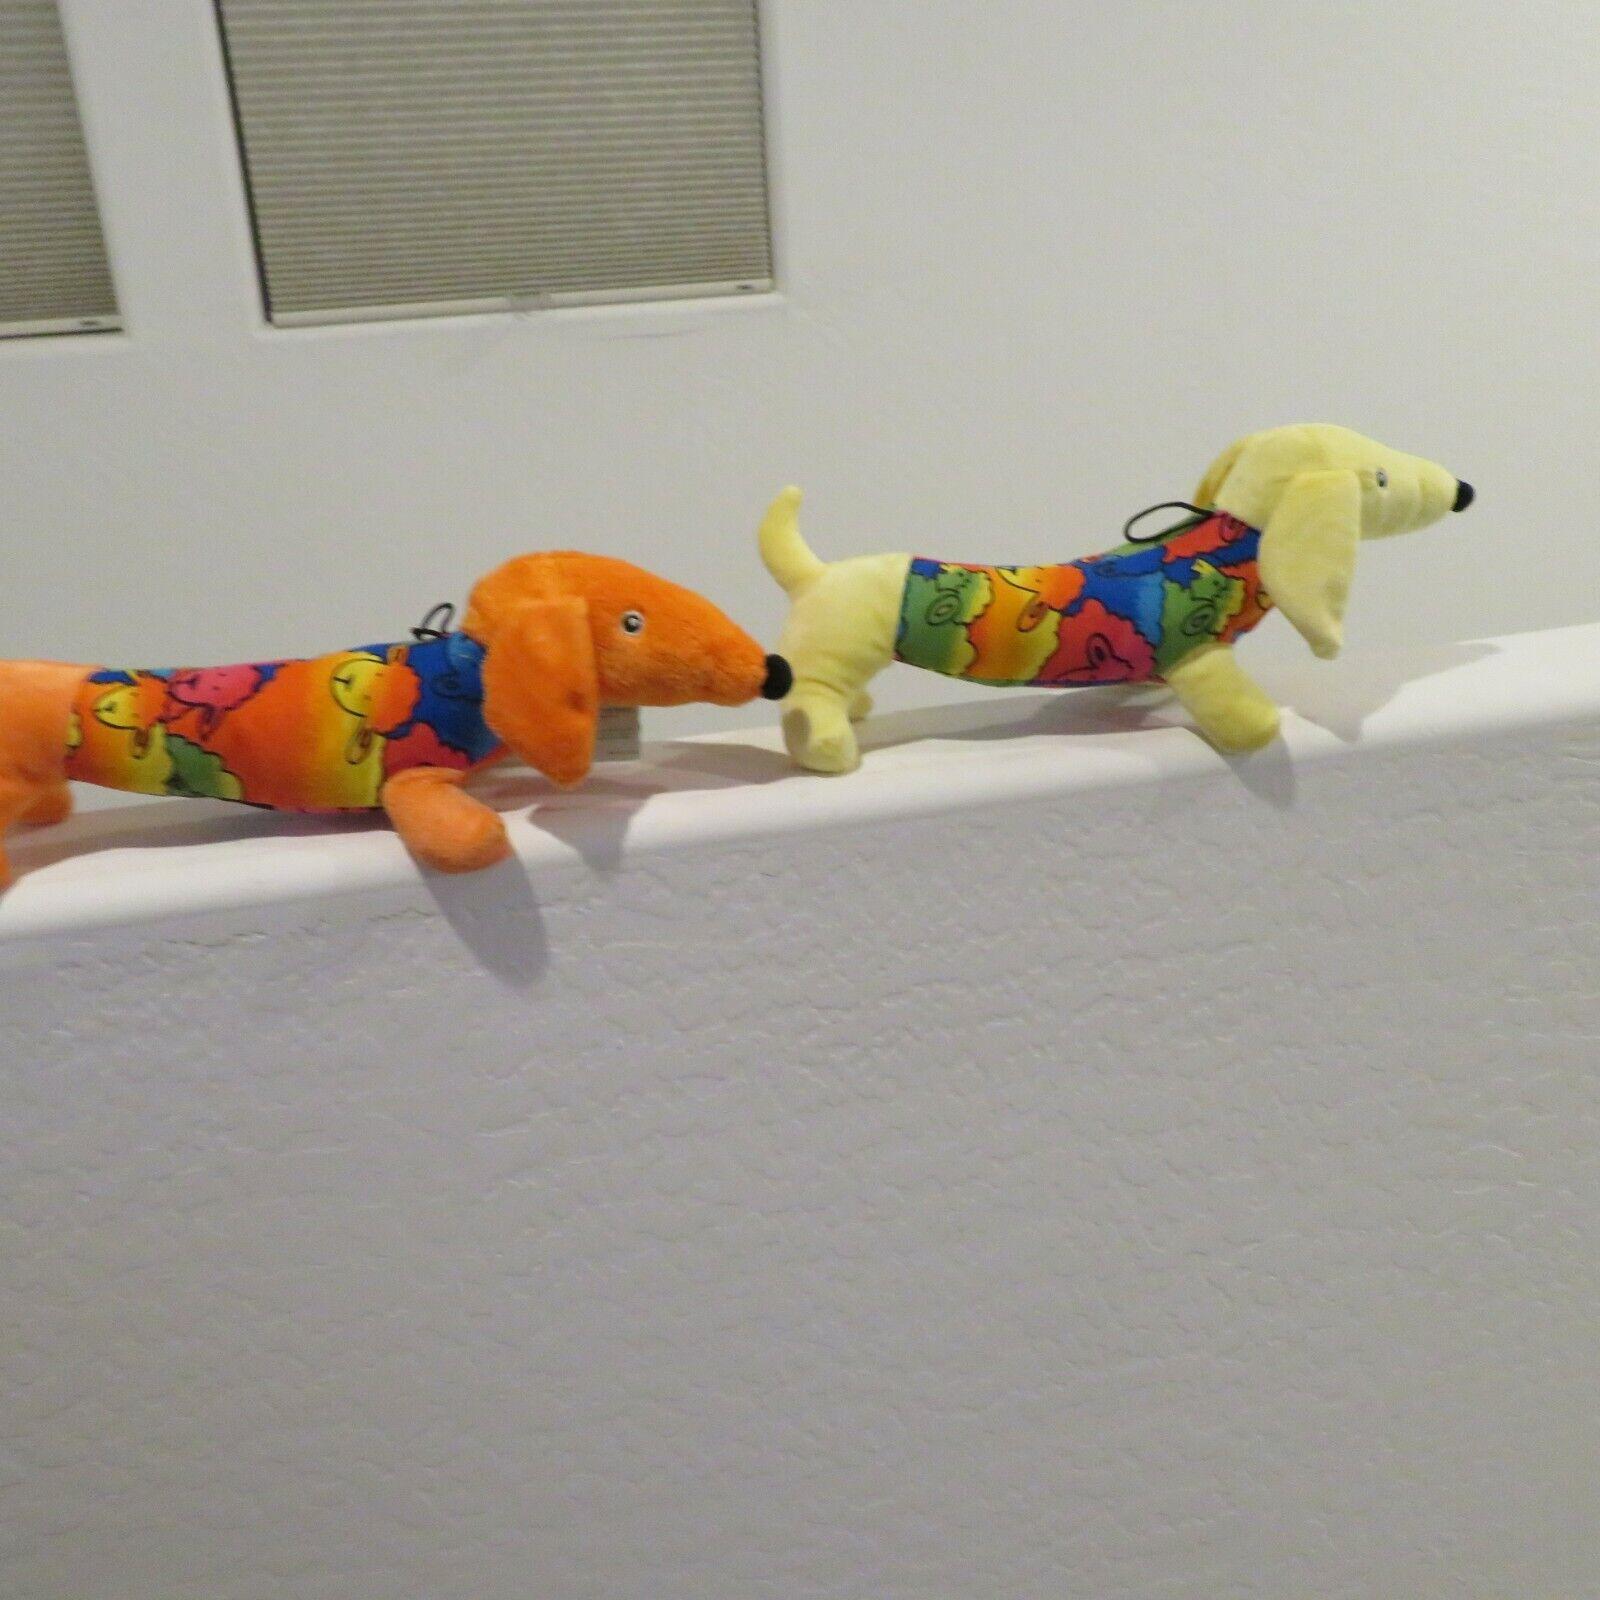 2 Plush Day Glow Squeak Dachshund Dog Toy Stuffed Animals - Orange Yellow NWT - $19.99